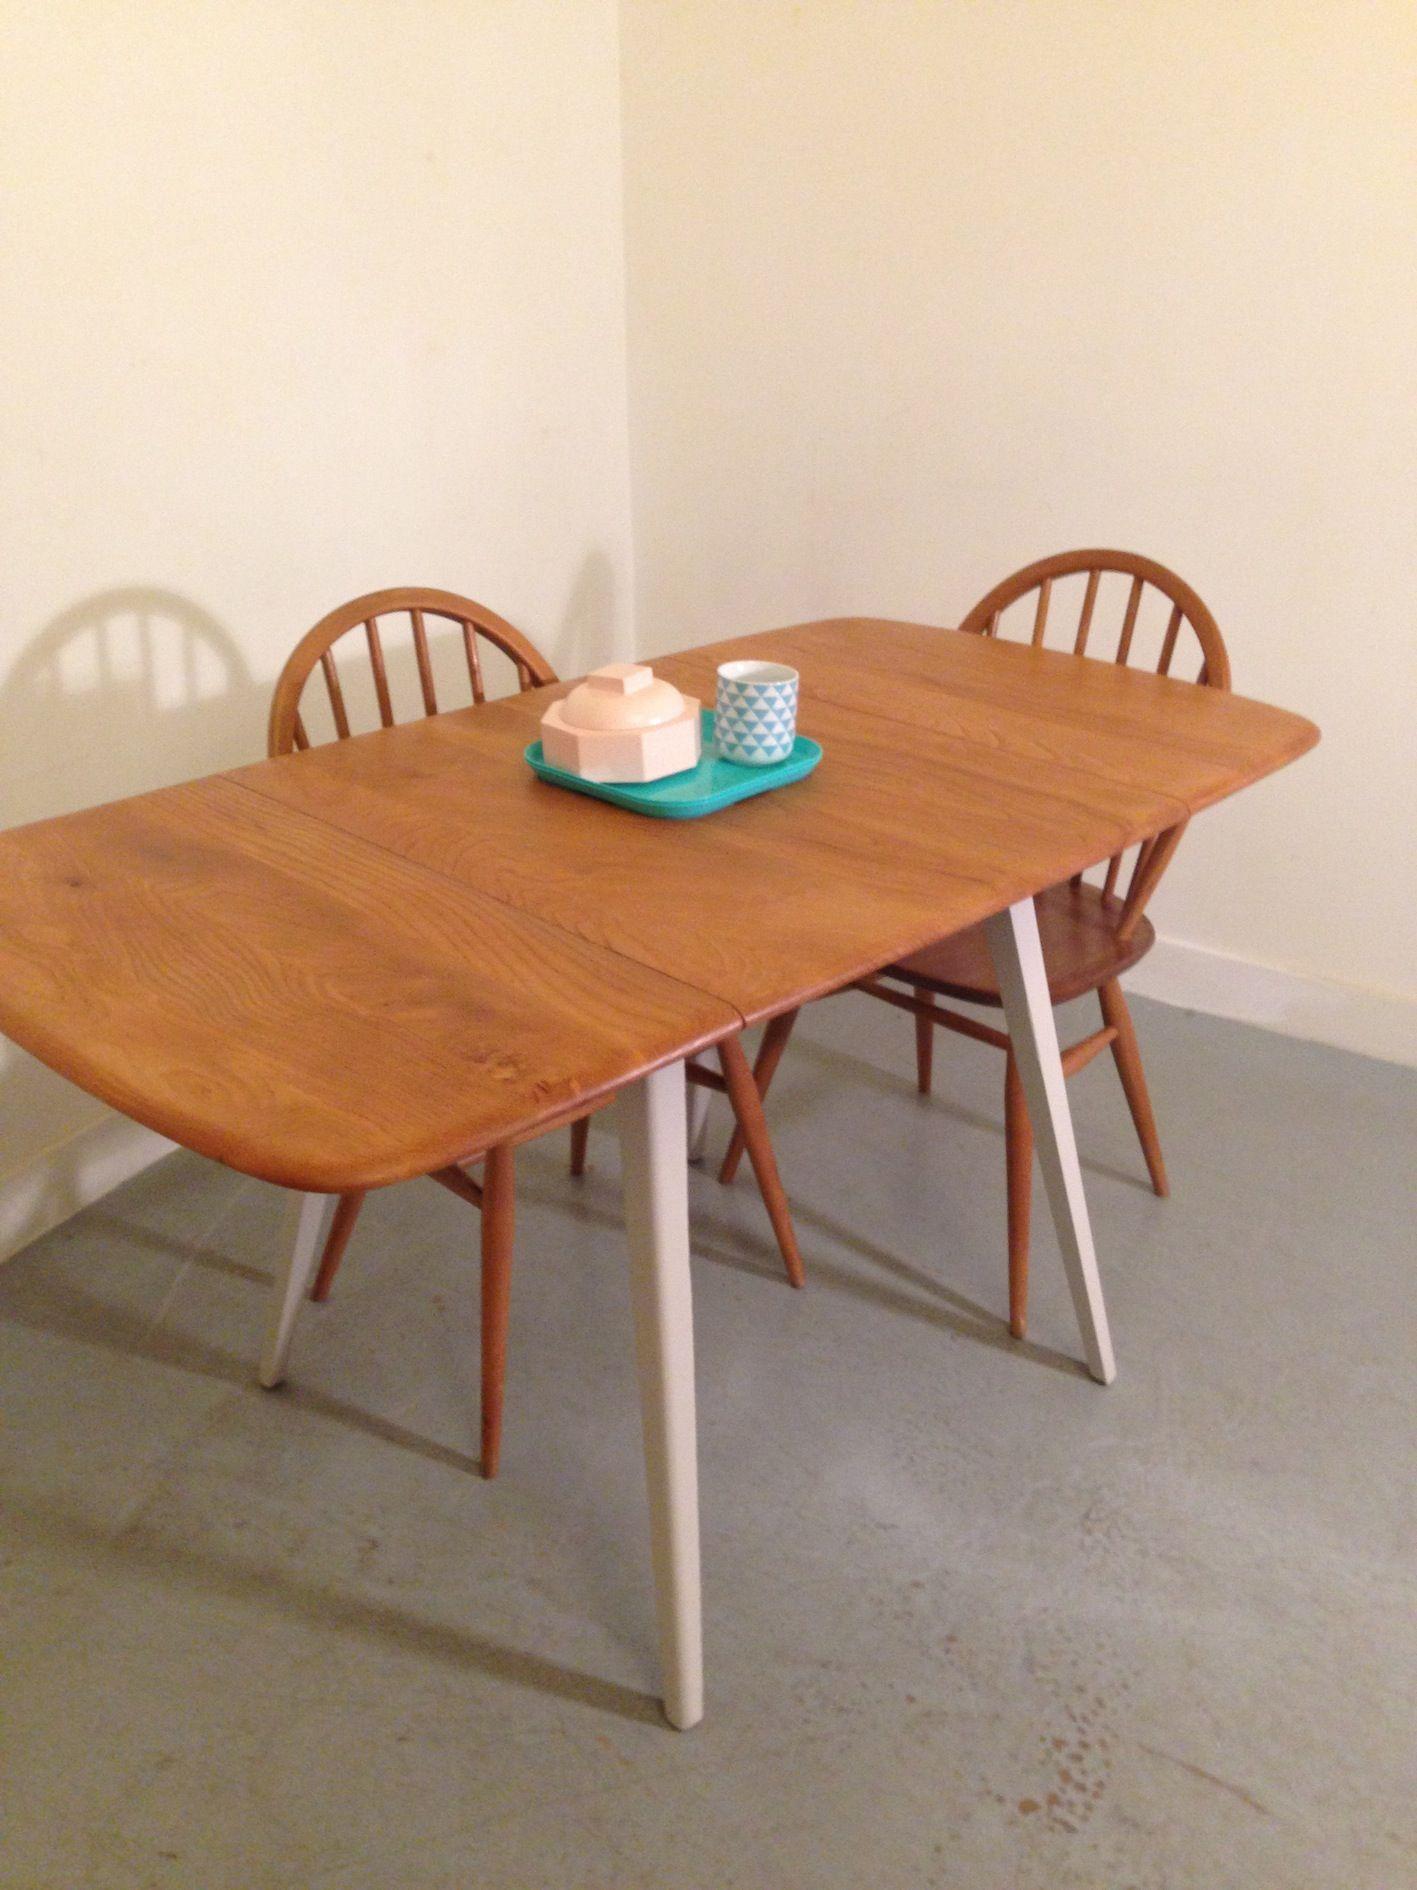 general store paris table manger vintage par ercol table manger pliante vintage 1960 s. Black Bedroom Furniture Sets. Home Design Ideas